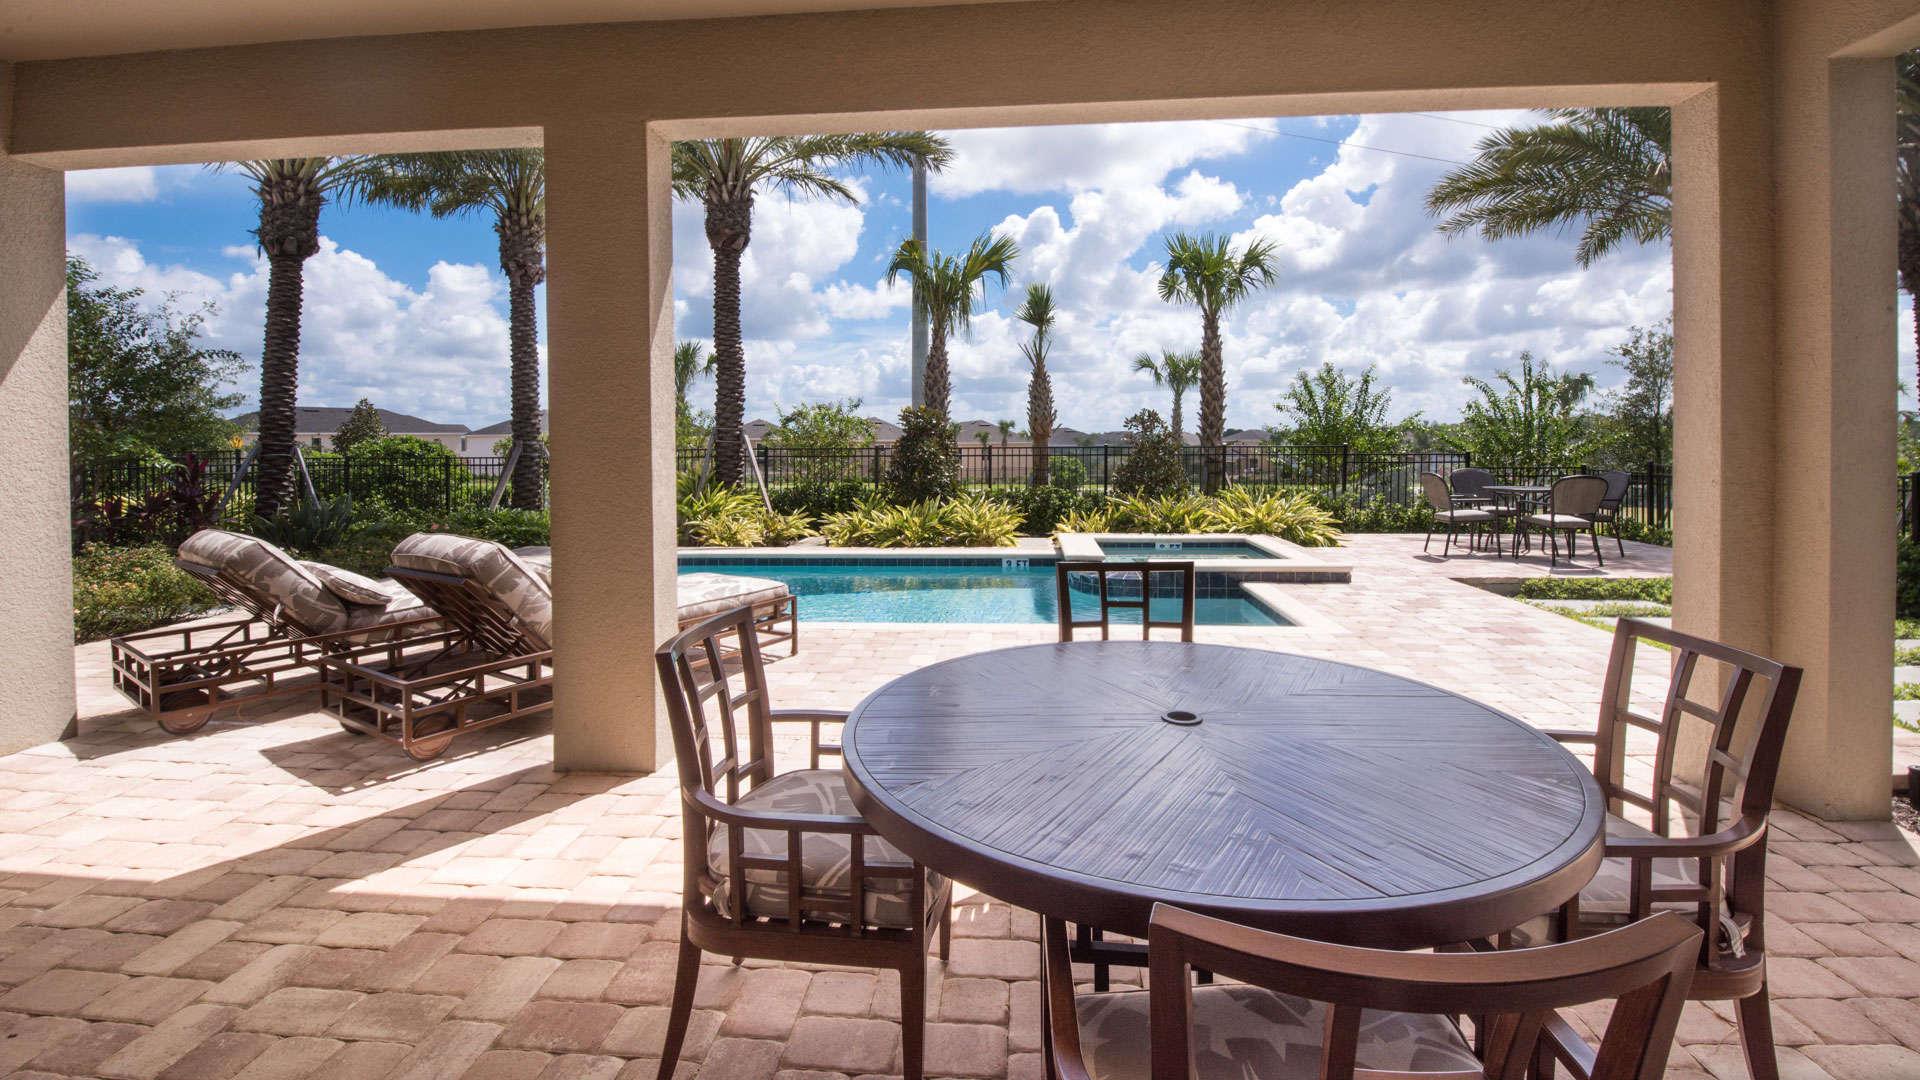 Luxury vacation rentals usa - Florida - Orlando  kissimmee - Encore resortatreunion - 5 BDM Homes - Image 1/18